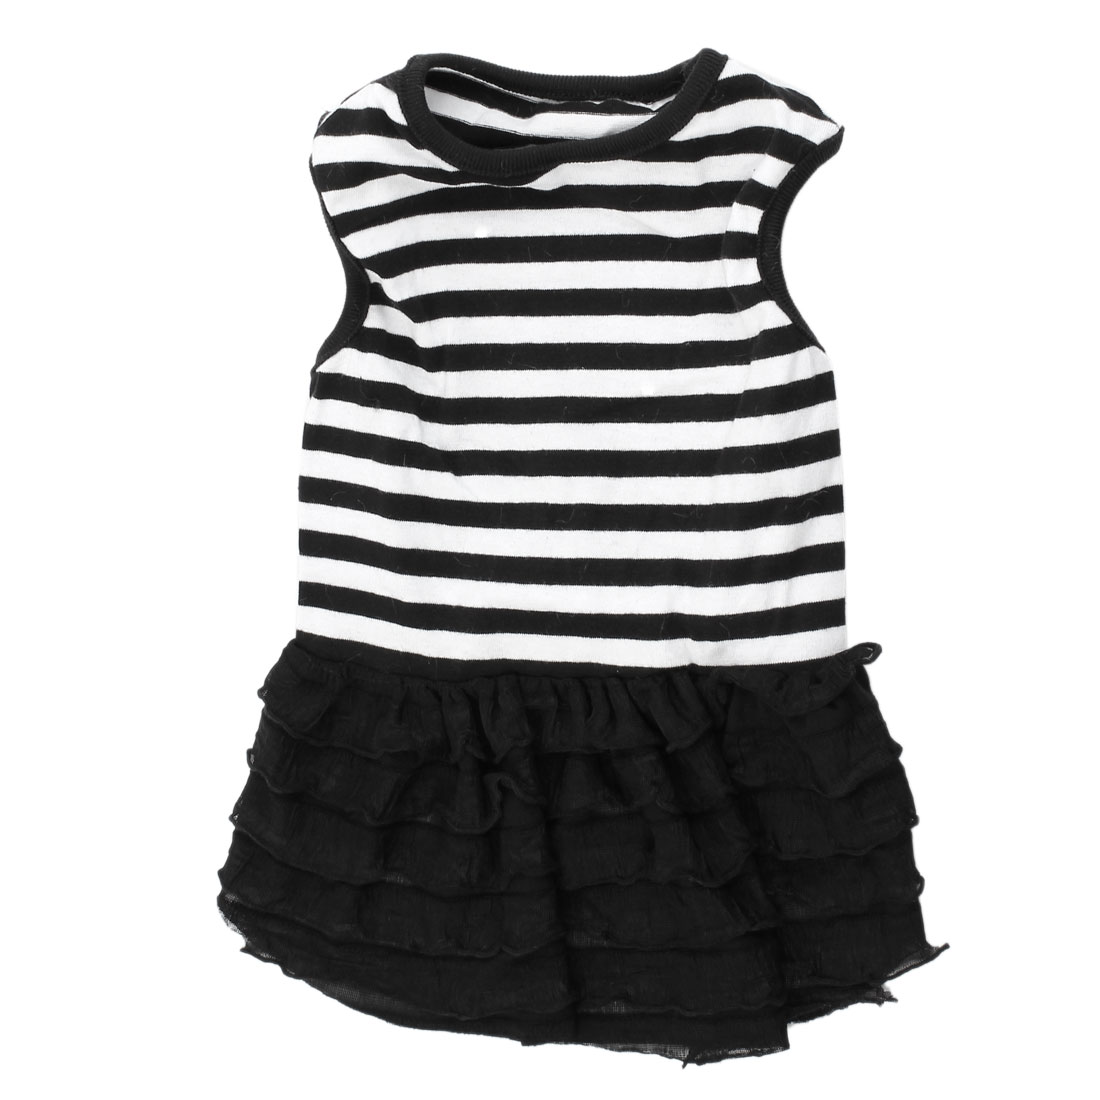 Round Collar Layered Stripe Pattern Pet Dog Yorkie Dress Skirt Black White S